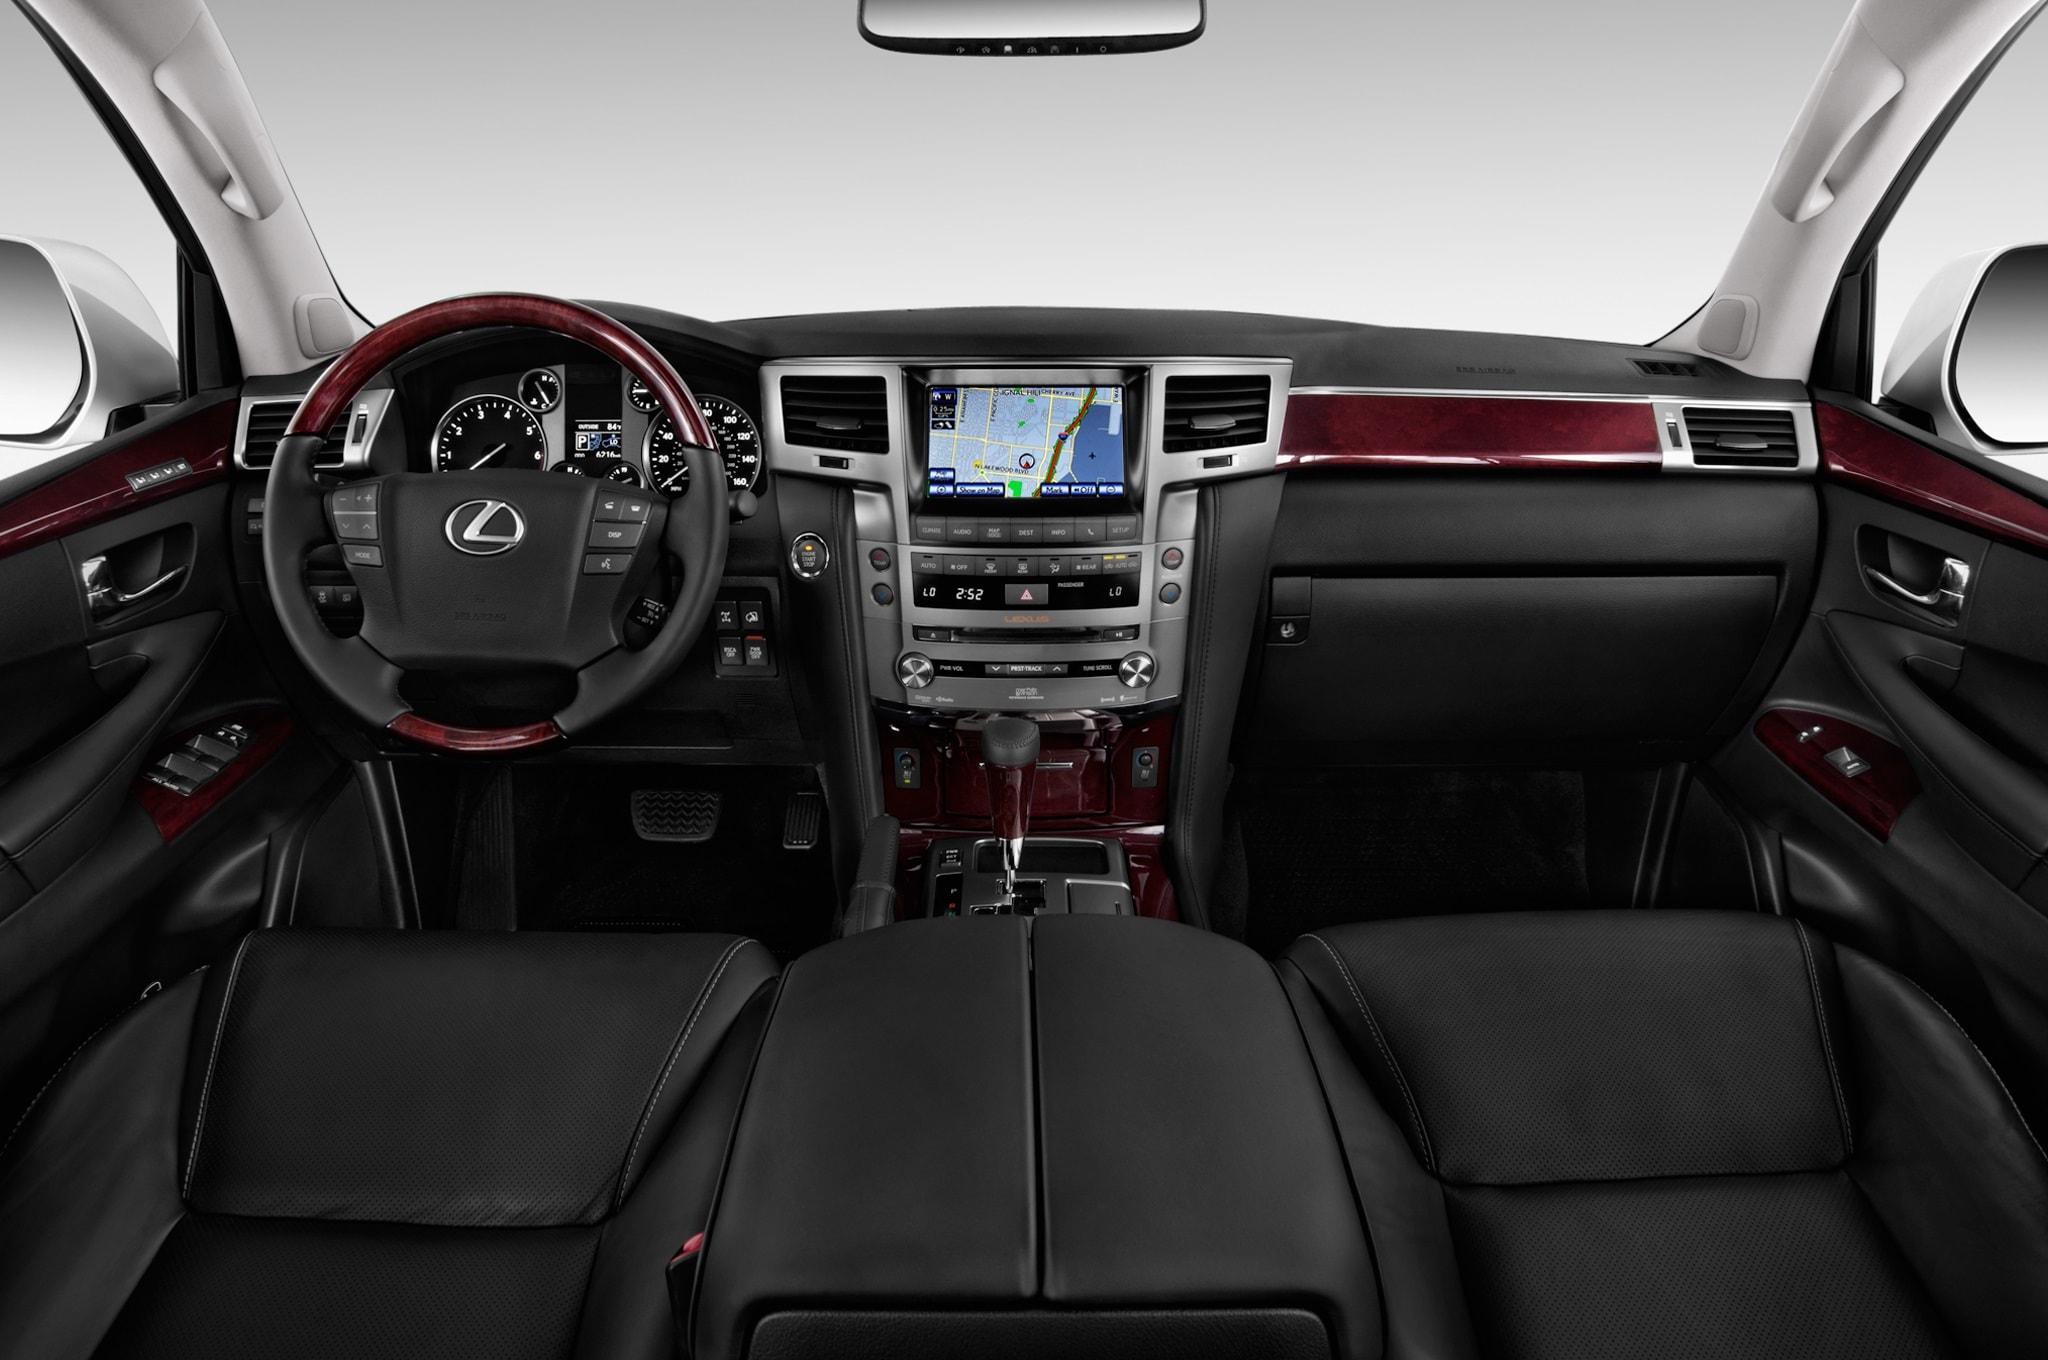 Lexus LX 570 FL Wallpapers hd